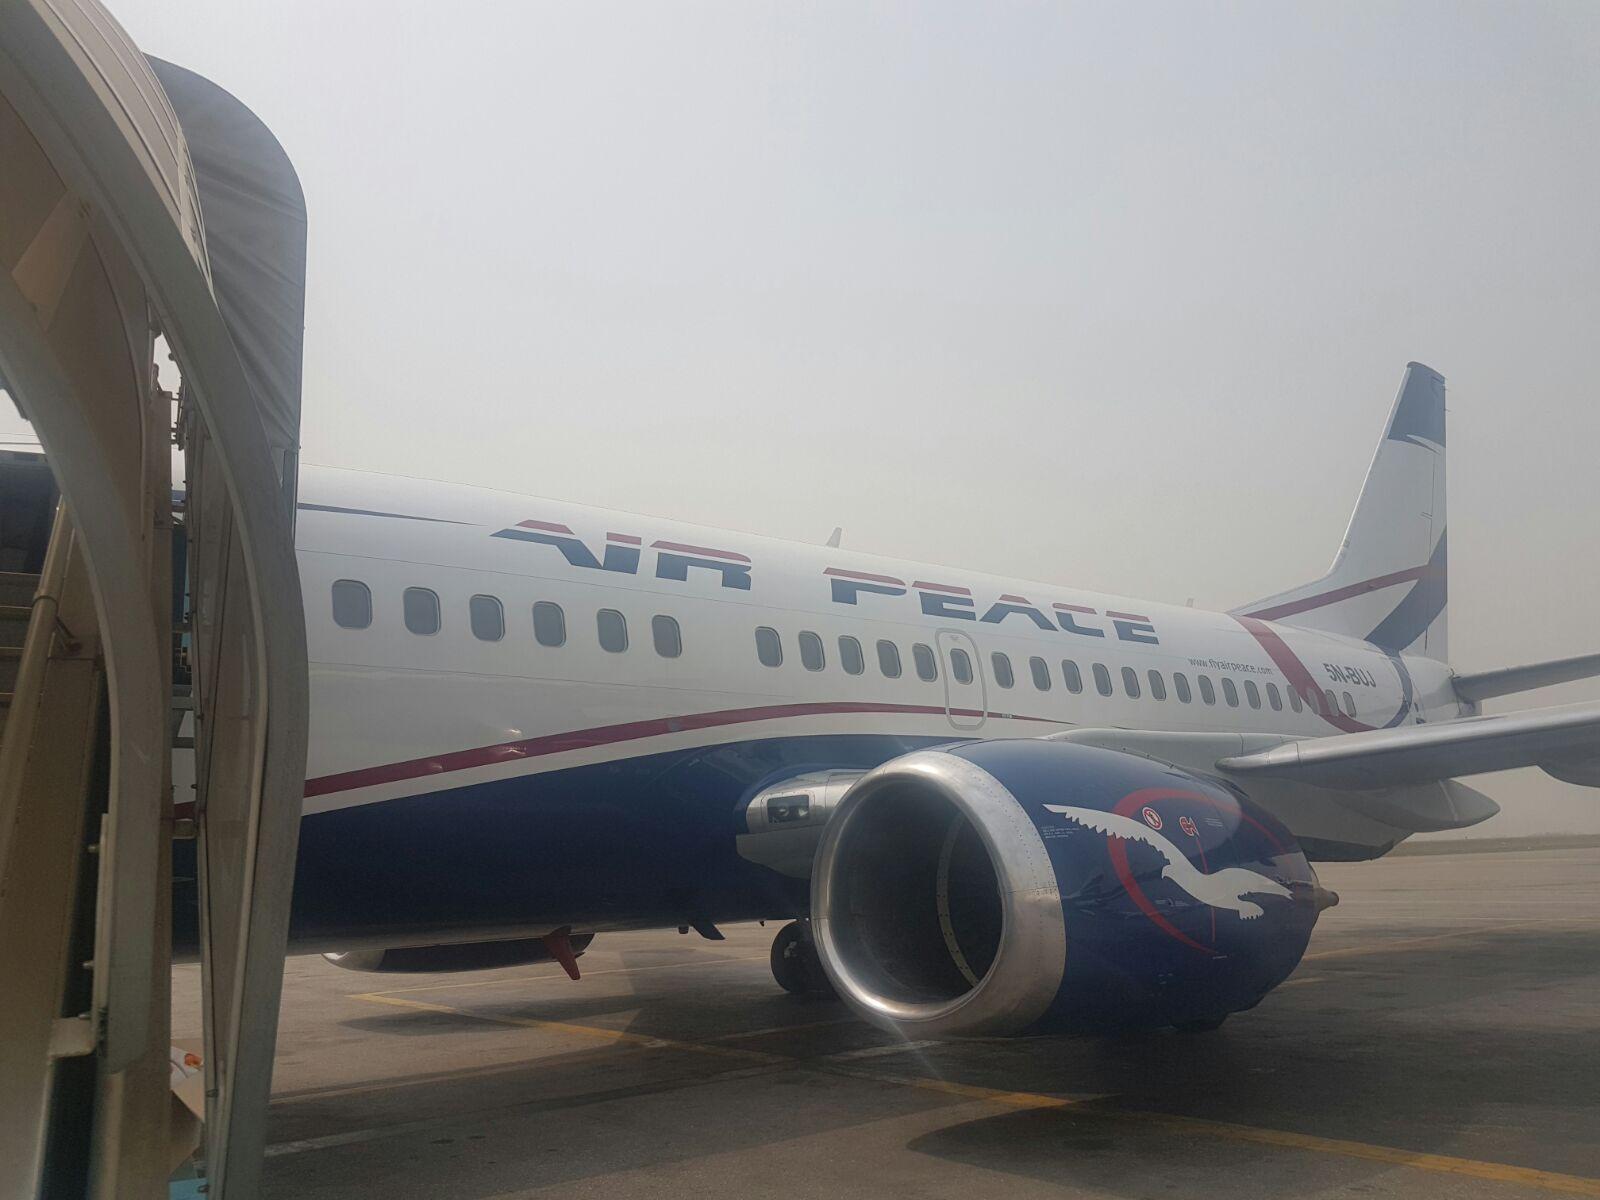 Air Peace's new B737-500 aircraft at the Murtala Muhammed Airport, Lagos on Tuesday